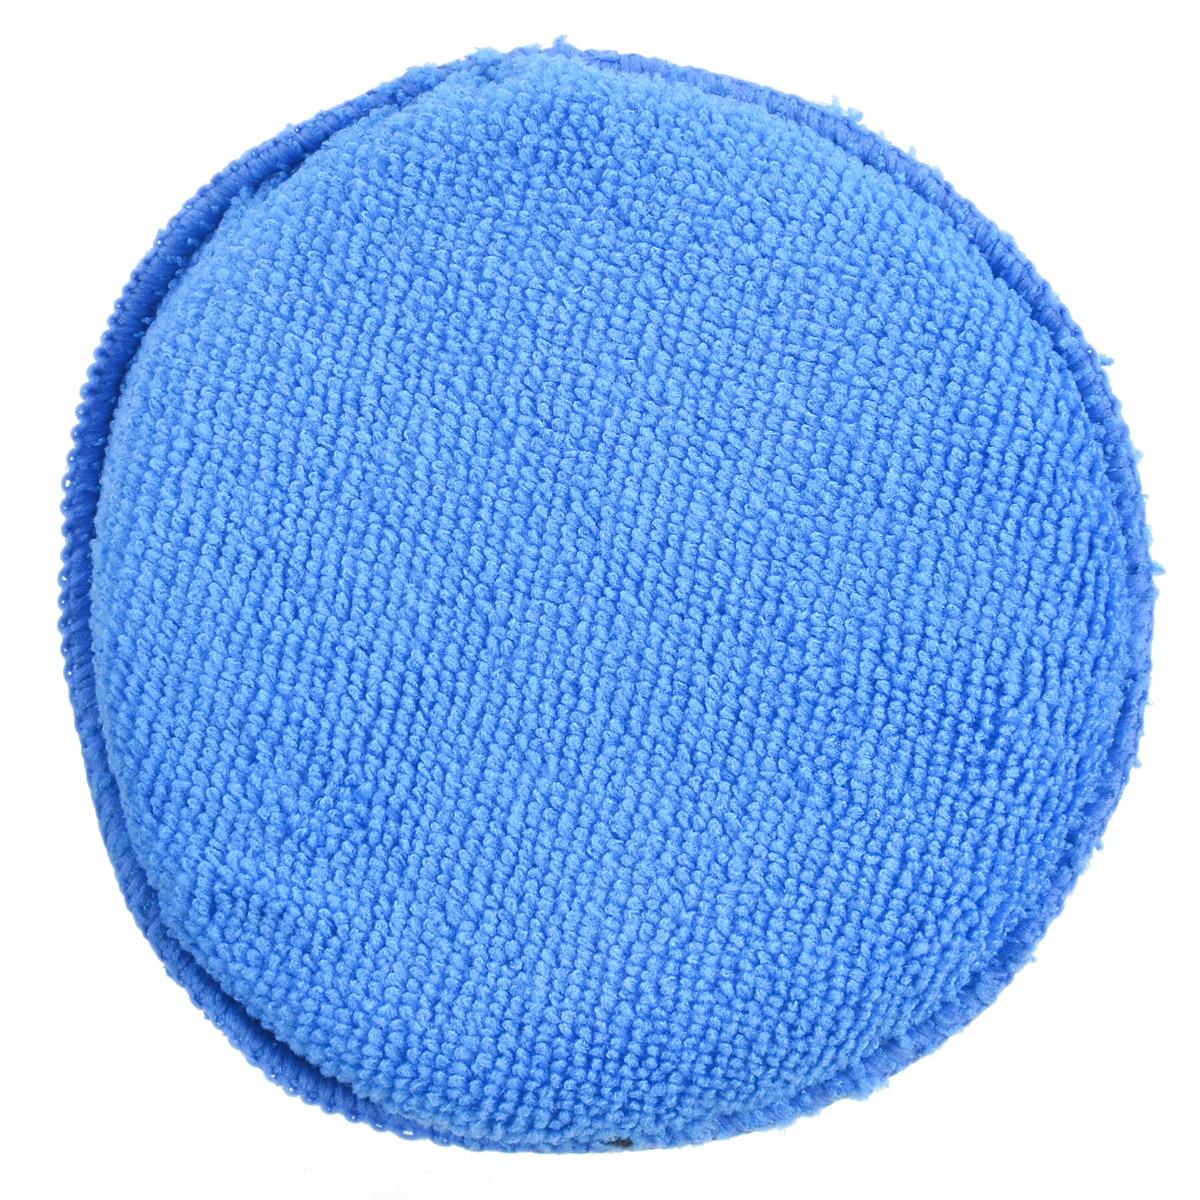 Mayitr 5 Pcs Microfiber Car Waxing Polish Foam Sponge Pad Wax Applicator Cleaning Detailing Pads Blue Mat Diameter 5 inch